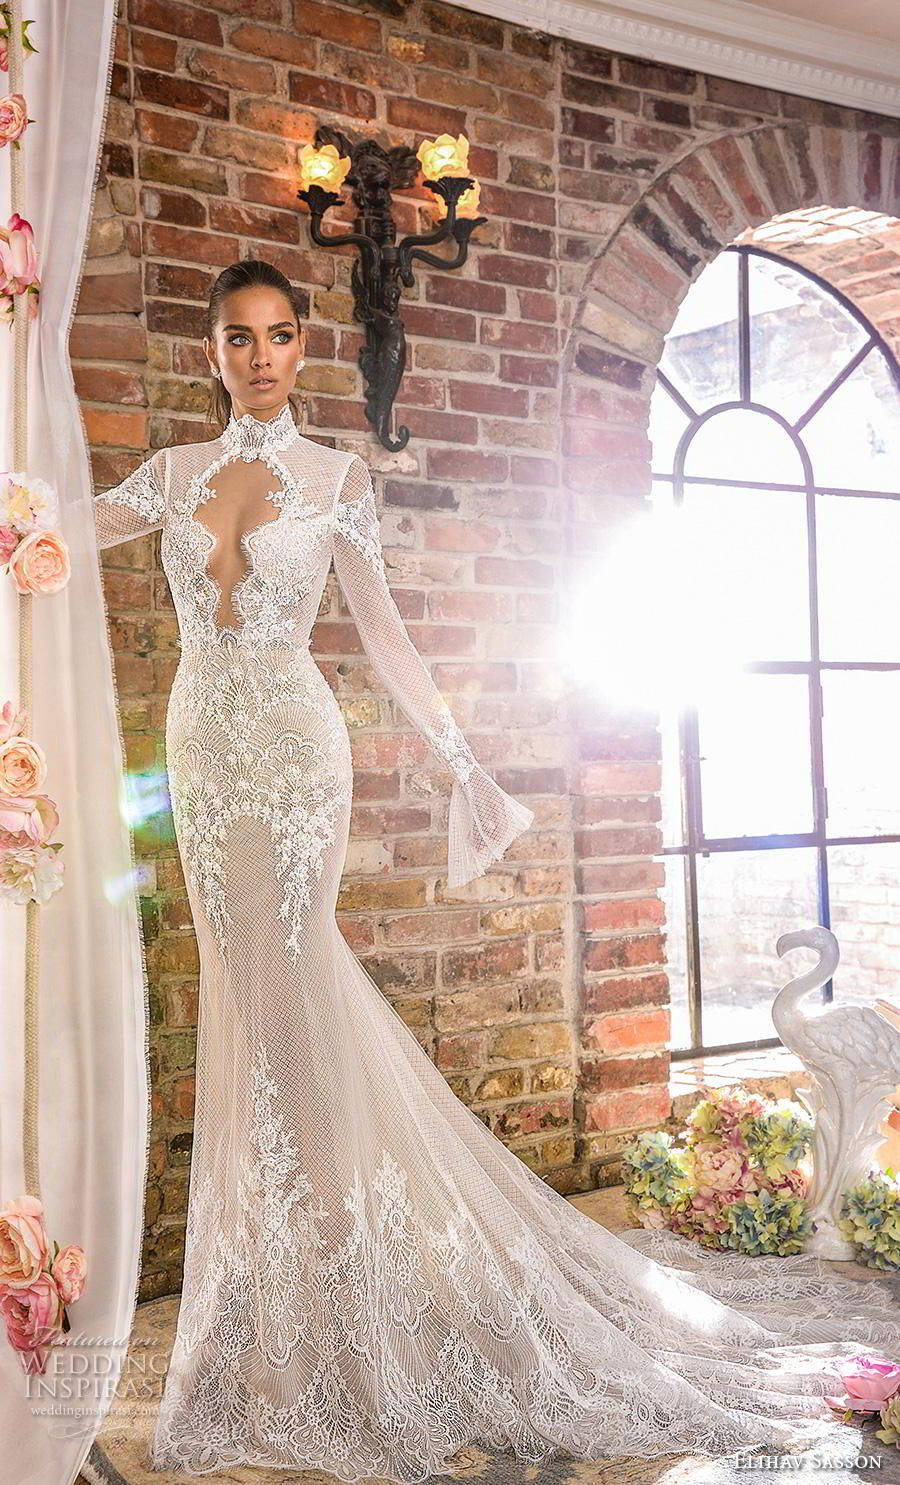 a0cfc336ee elihav sasson 2019 bridal long poet sleeves high neck keyhole bodice full  embellishment elegant fit and flare wedding dress keyhole back chapel train  (6) mv ...